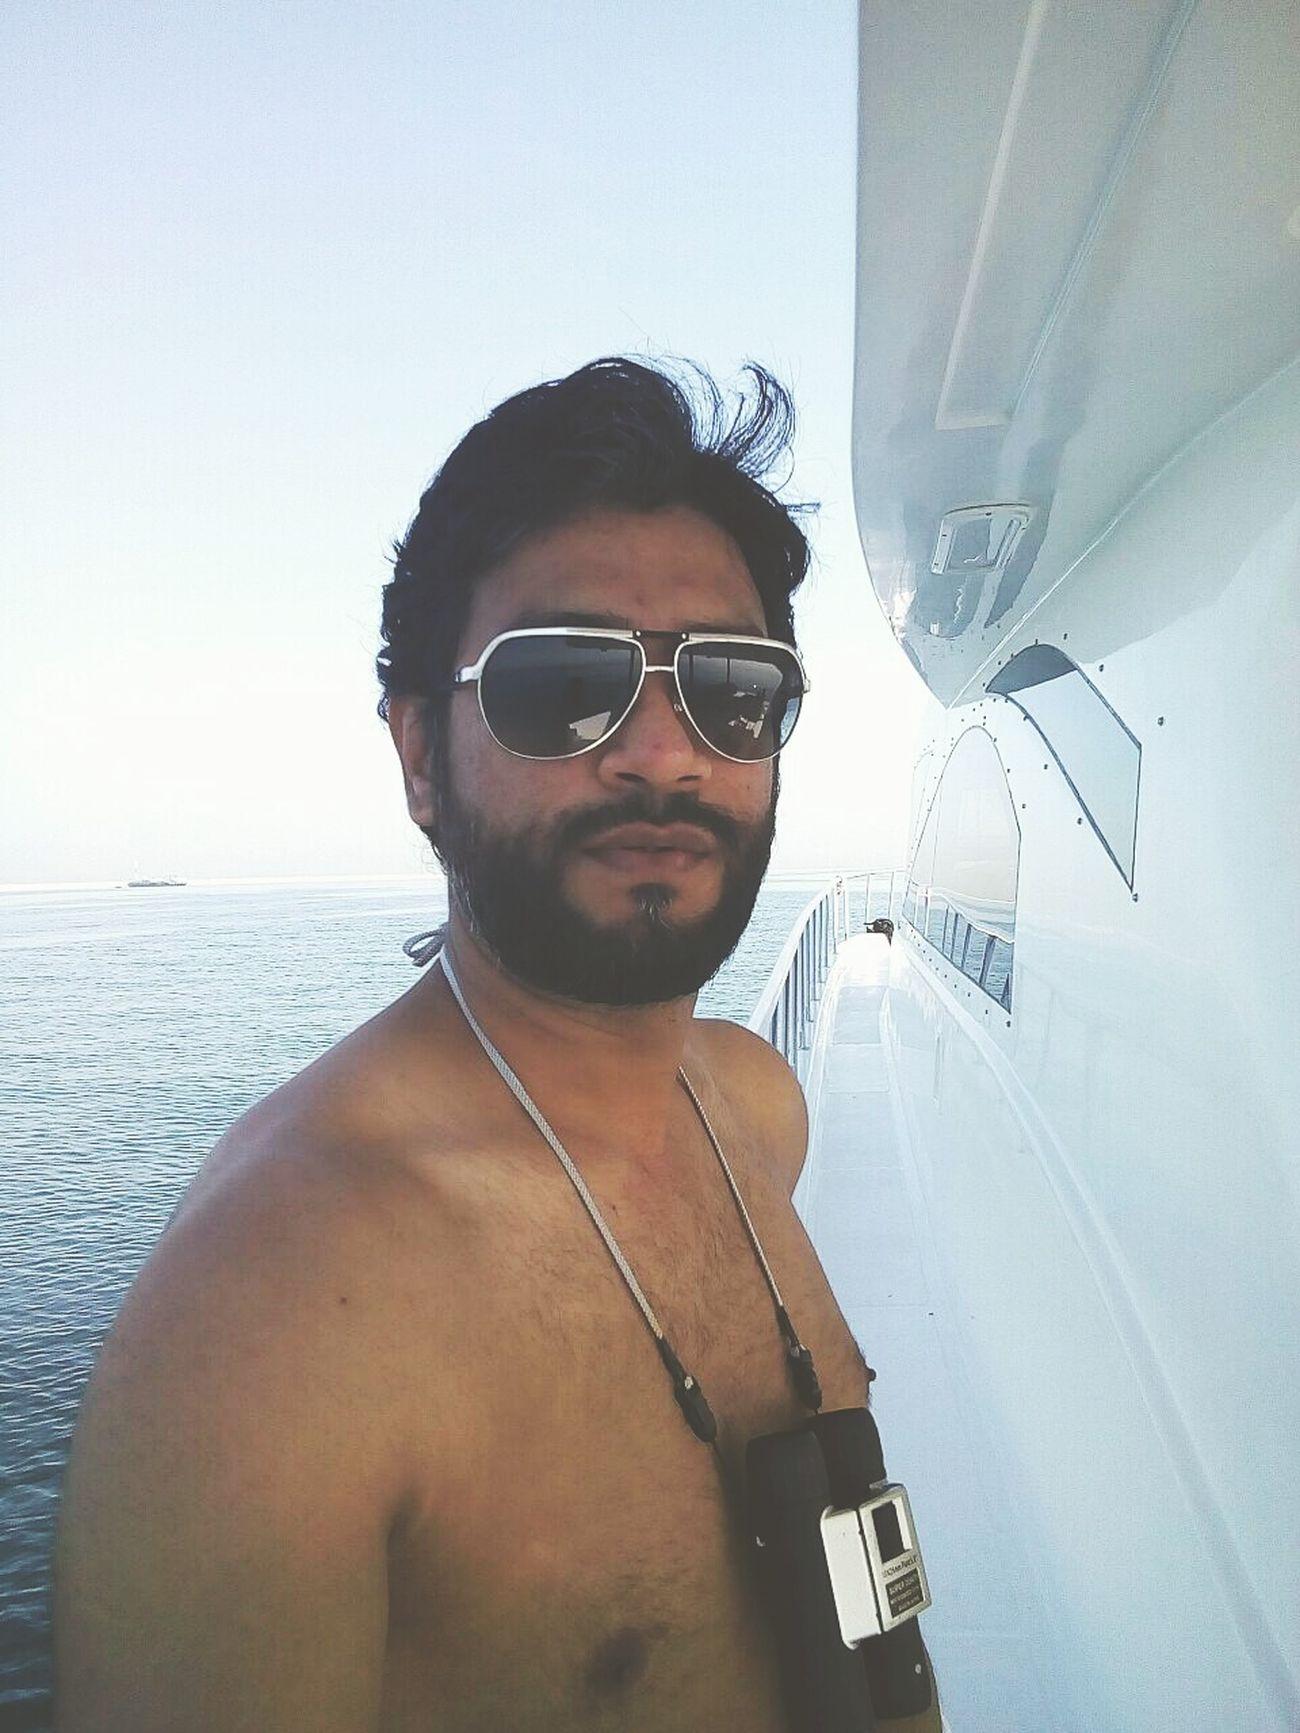 Big Bro..??⛅ Yacht Unitedarabemirates Abudhabi Lifeinuae Sealife ✌✌✌